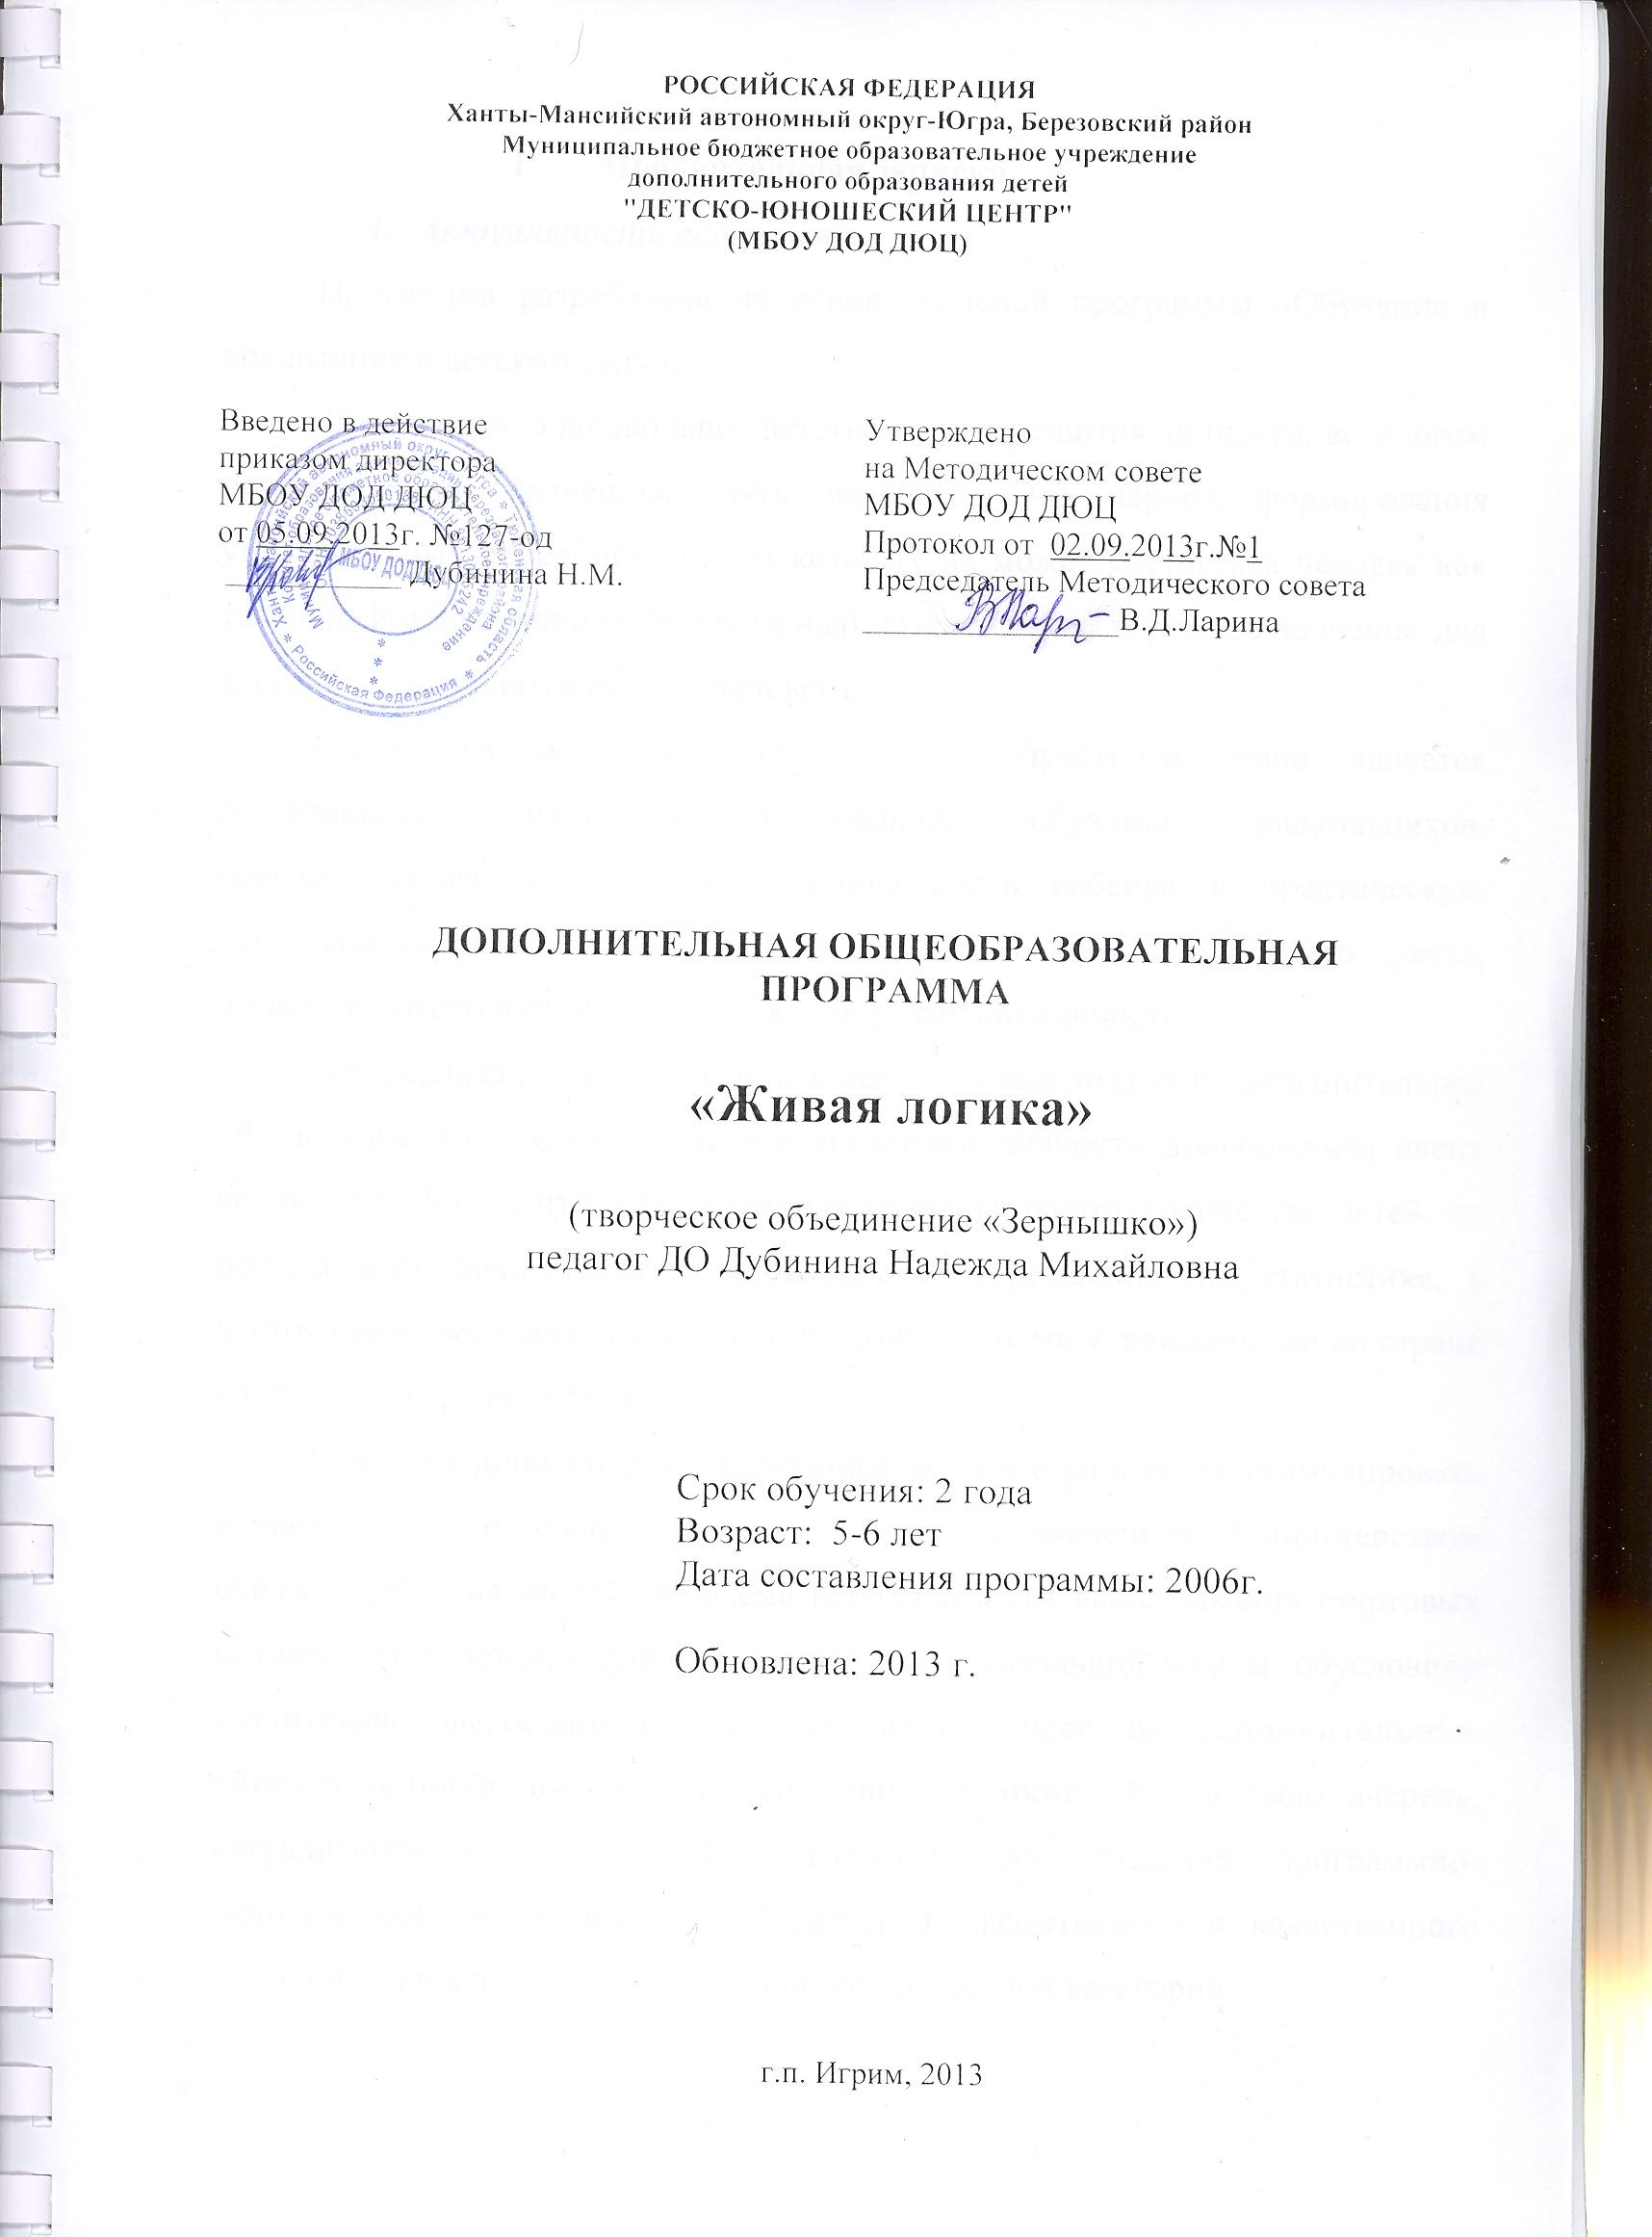 C:\Documents and Settings\123\Рабочий стол\2014-02 (фев)\сканирование0020.jpg